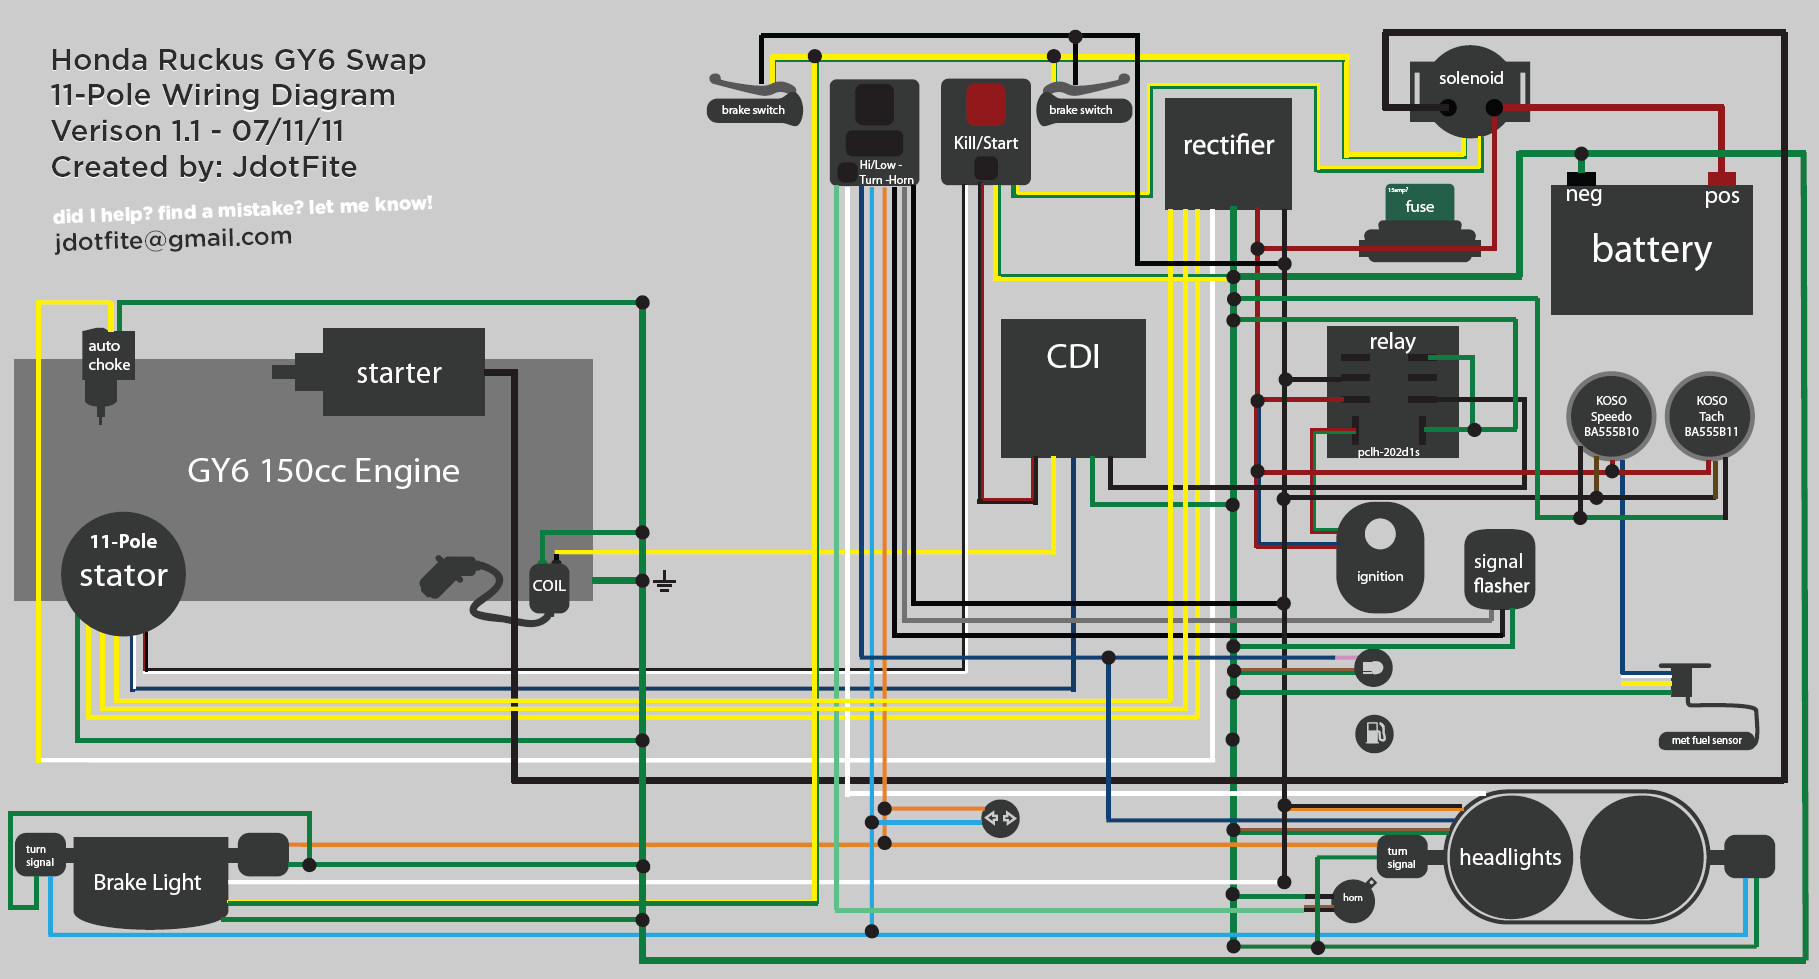 Ruckus Gy6 Swap Wiring Diagram | Honda Ruckus Documentation - Gy6 Wiring Diagram